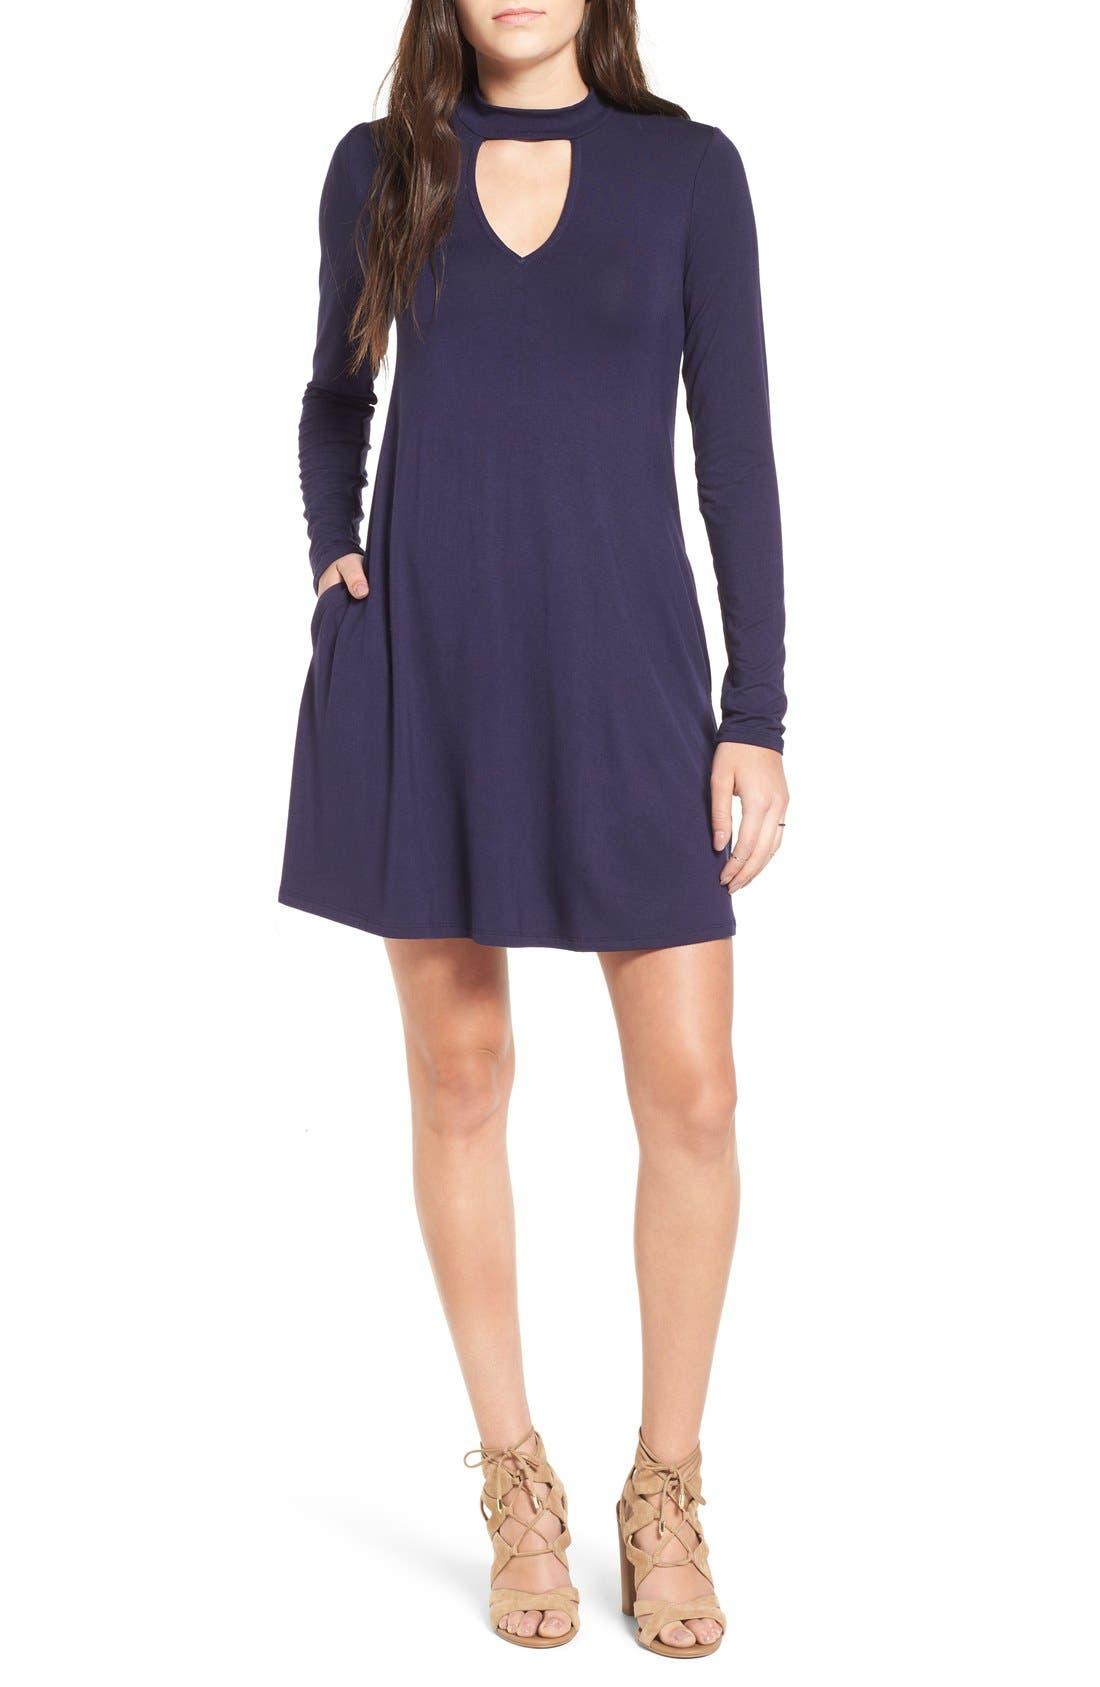 Alternate Image 1 Selected - Socialite Mock Neck Knit Shift Dress